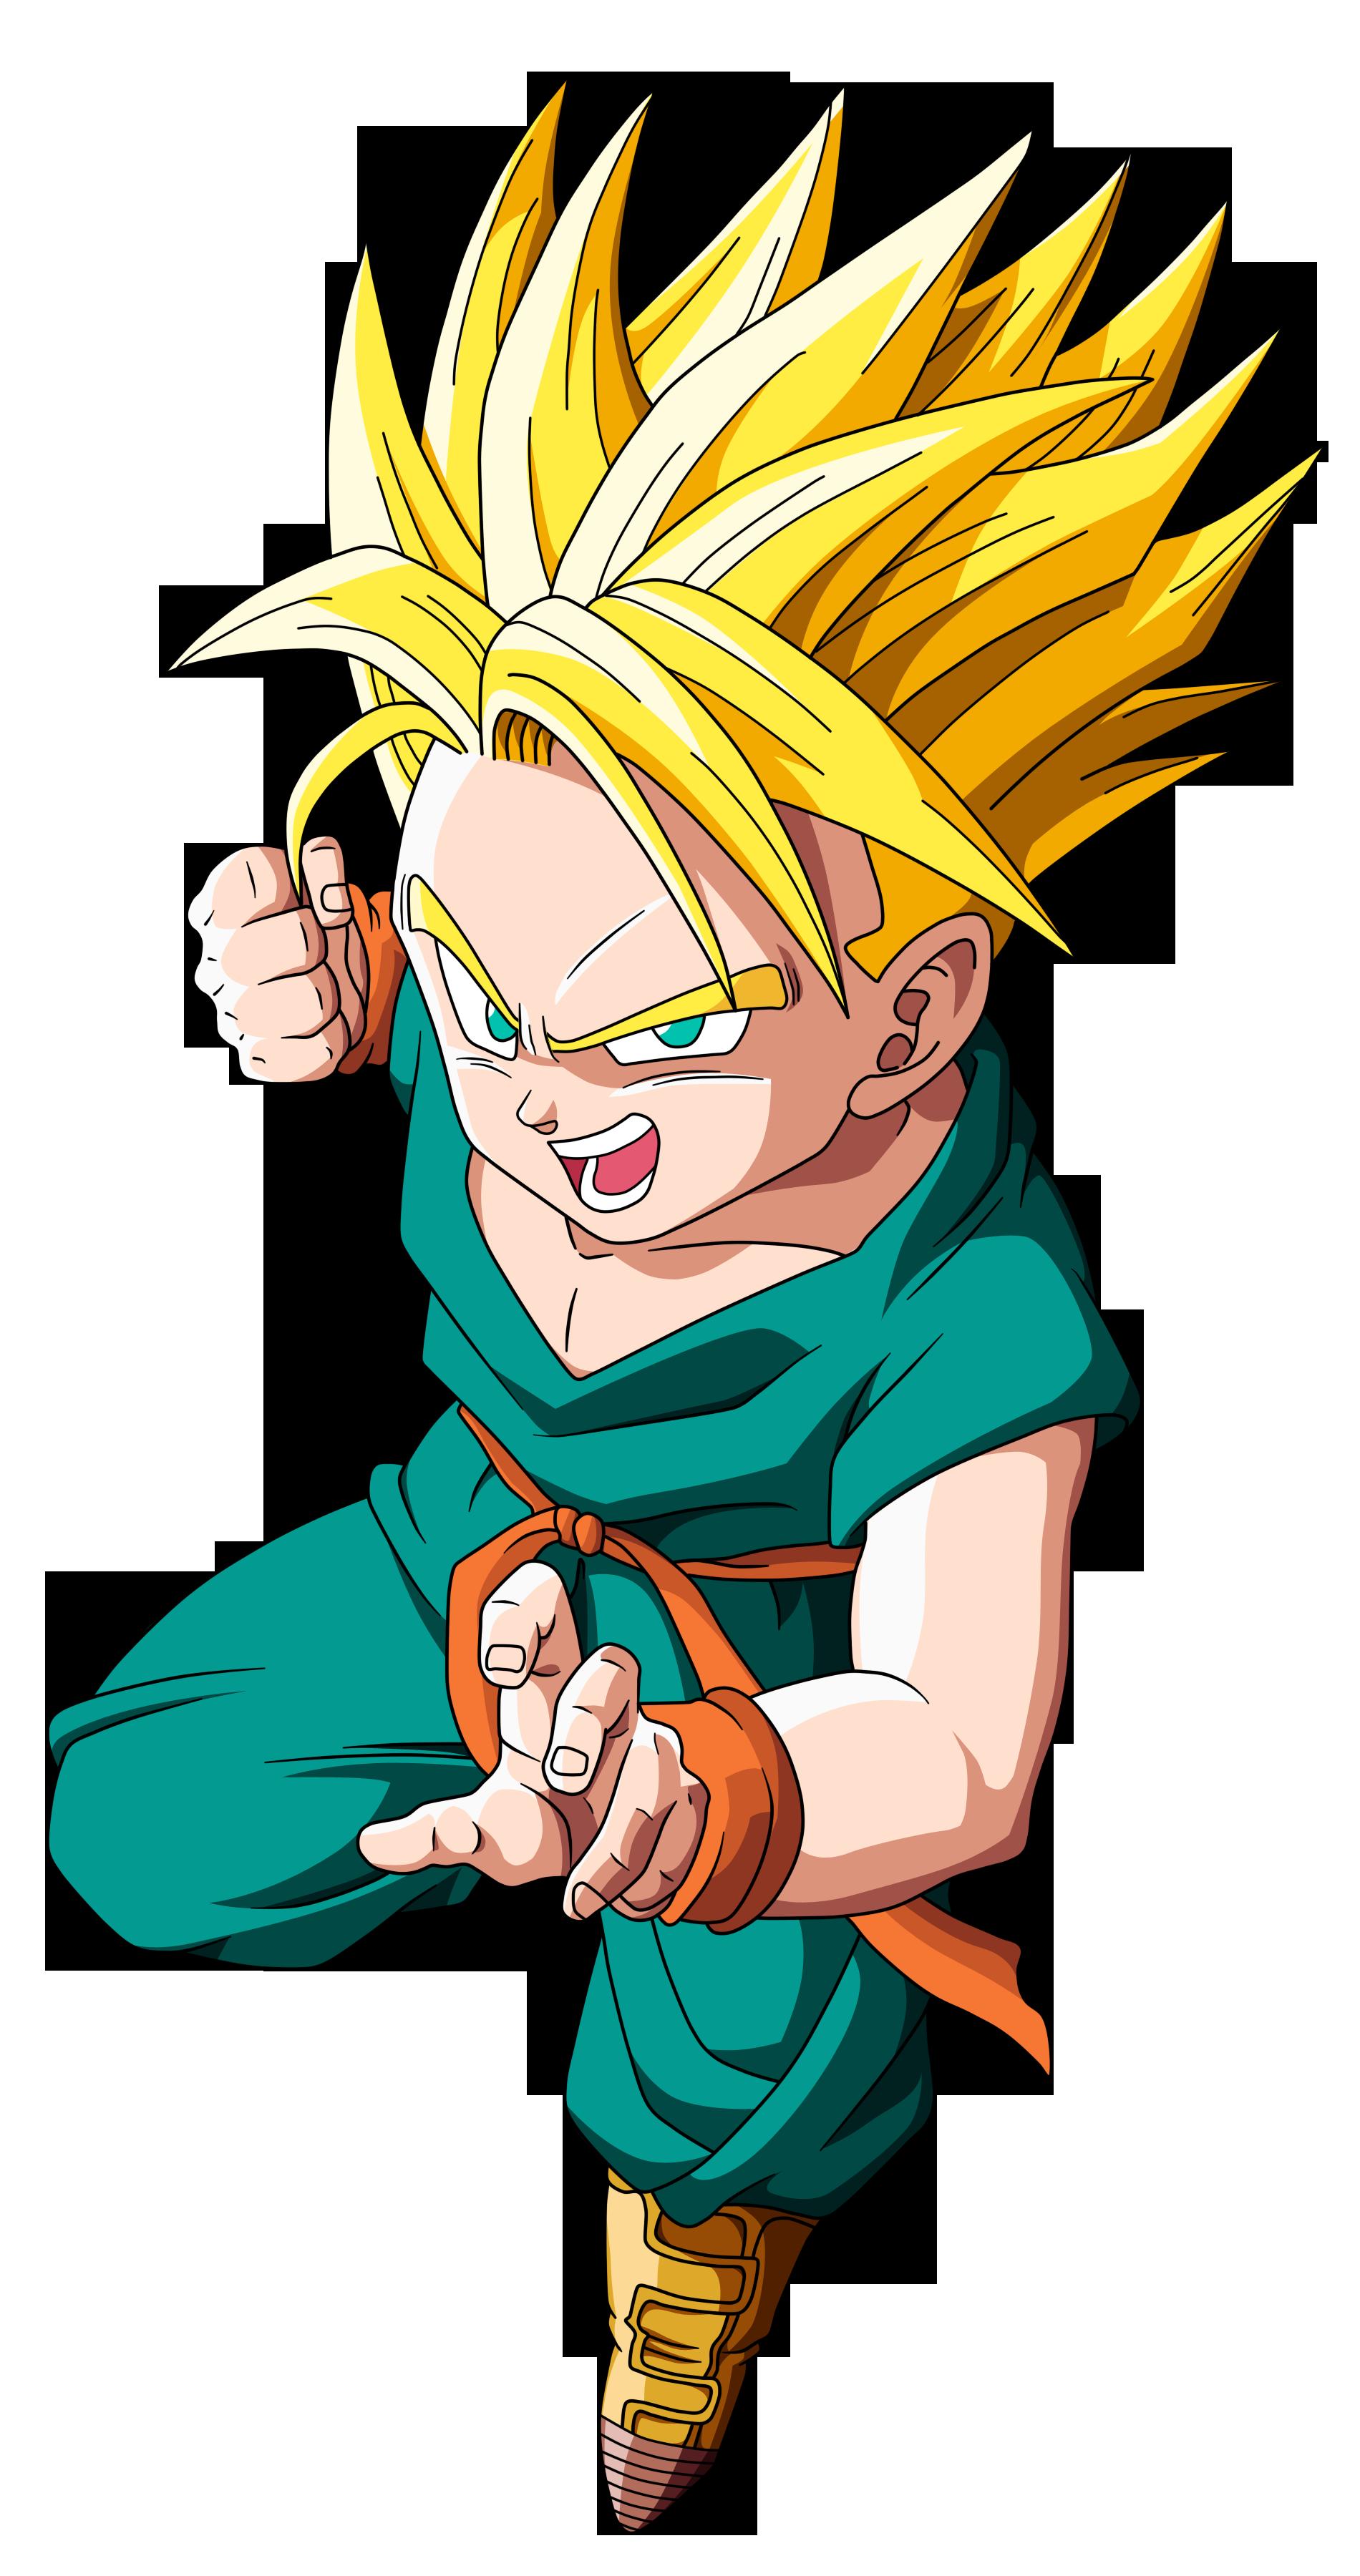 Fotos De Los Personajes De Dbz Megapost Manga Y An En Taringa Dragon Ball Artwork Dragon Ball Art Dragon Ball Wallpapers